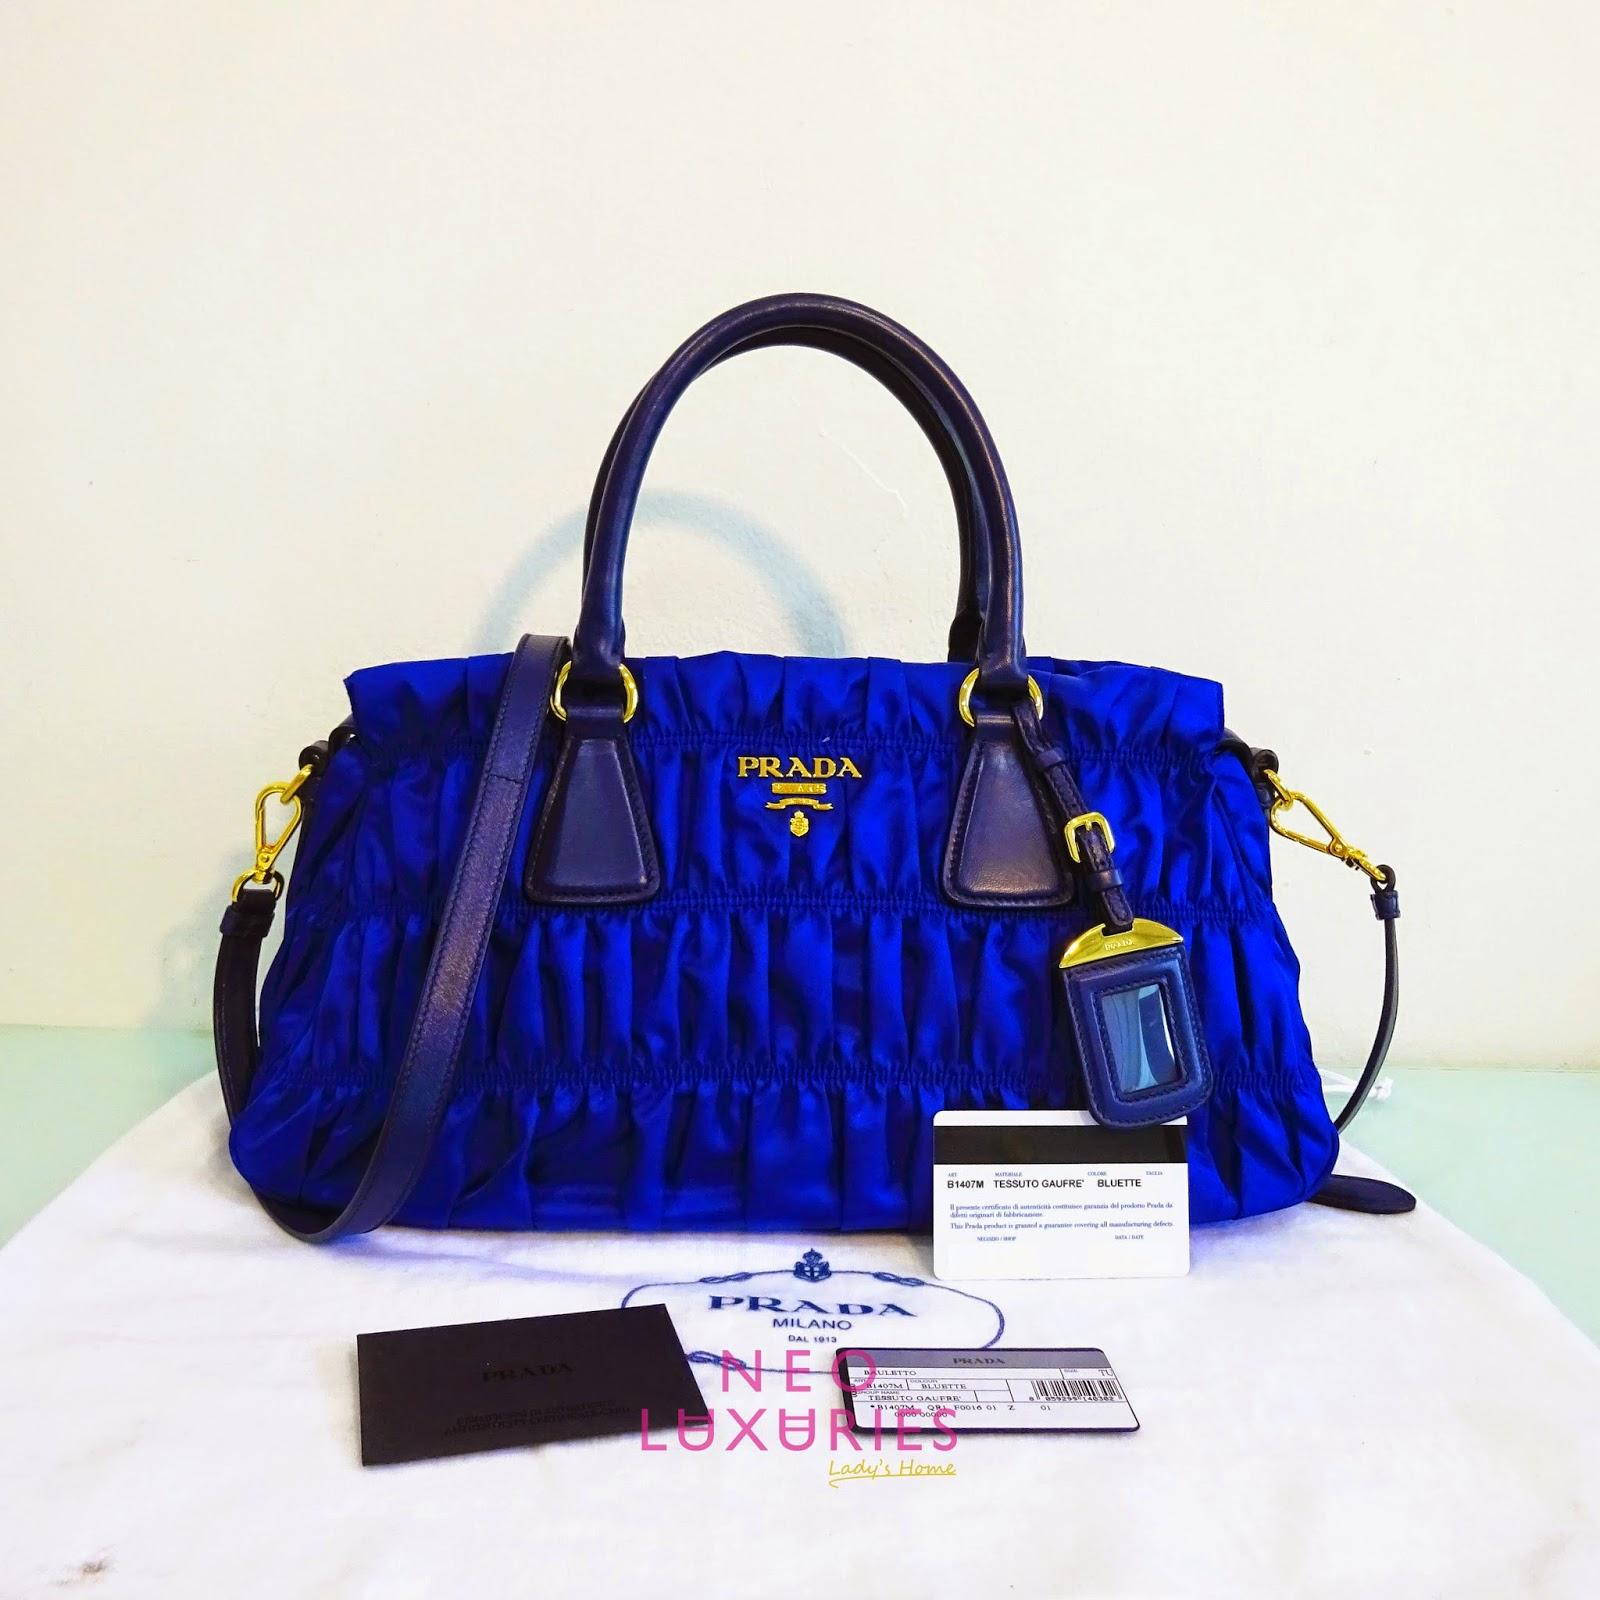 384bfb67abd8 free shipping black prada tessuto gaufre purse 6f53e 51b6e; norway comes  with dust bag tag and authenticity cards. sold february 2015 . prada tessuto